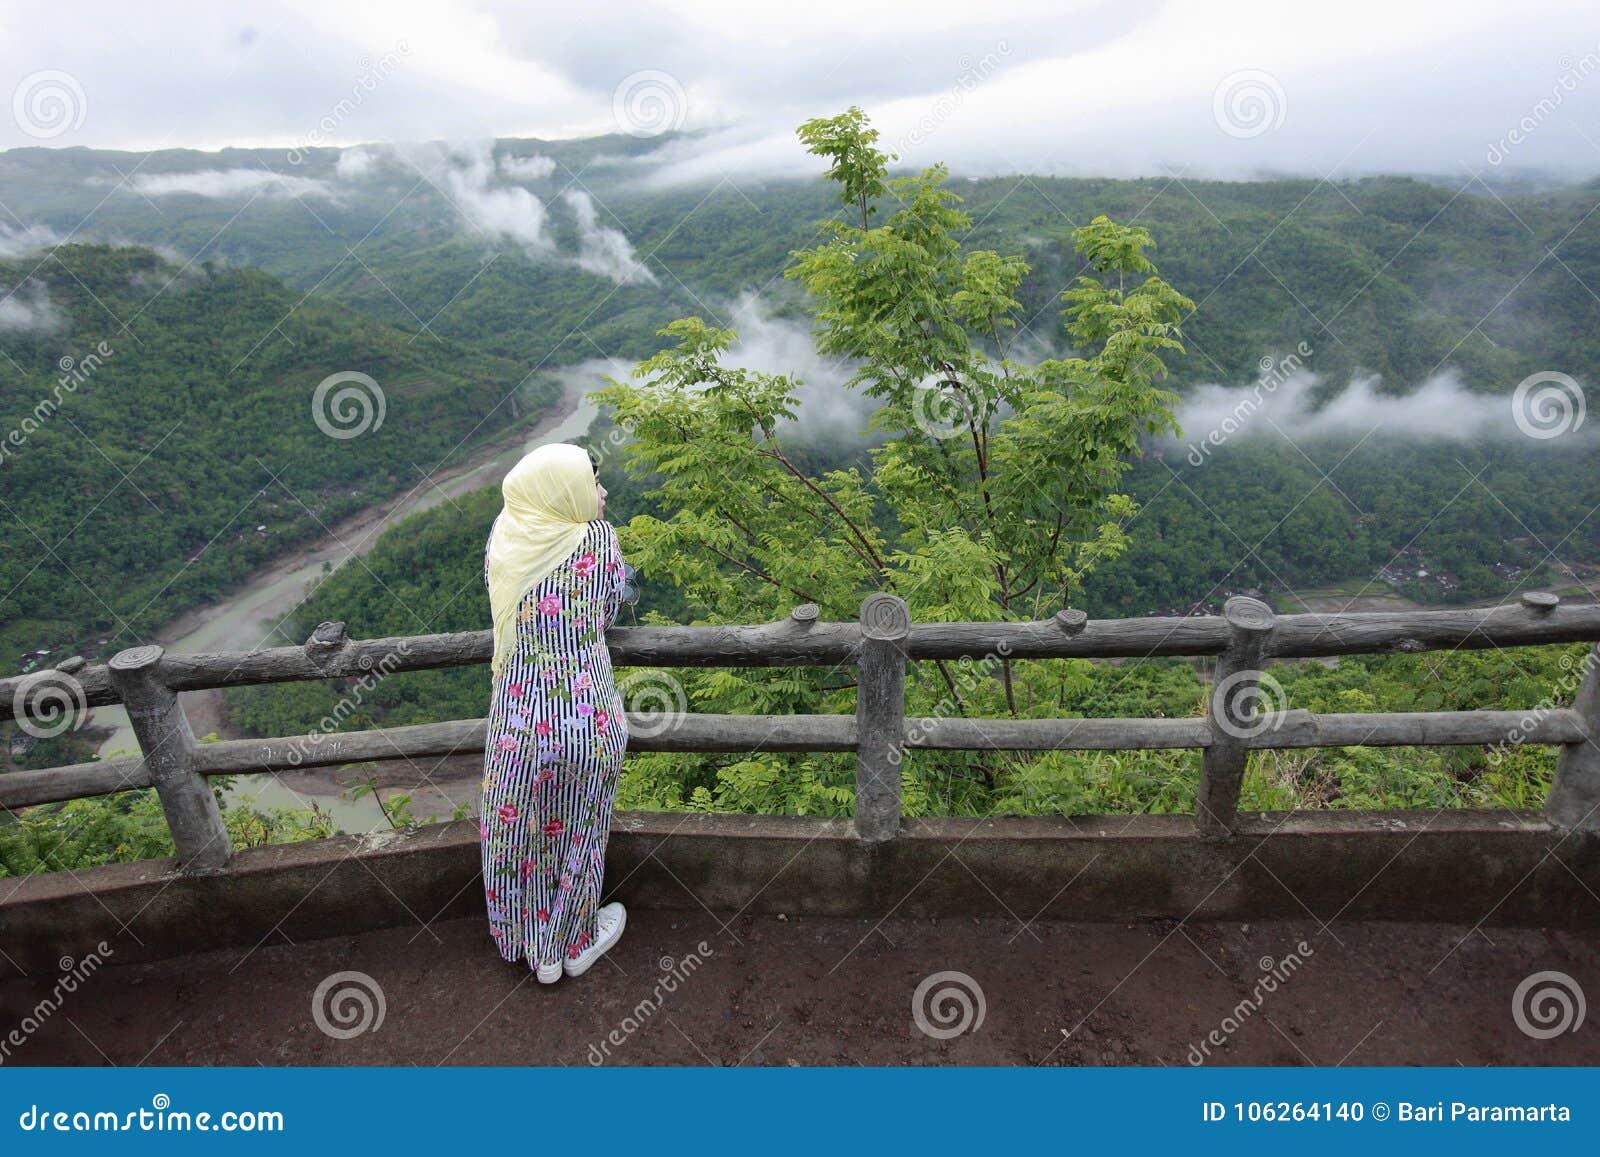 muslim women enjoy holiday cool nature mangunan bantul indonesia young yogyakarta traveling to natural scented place 106264140